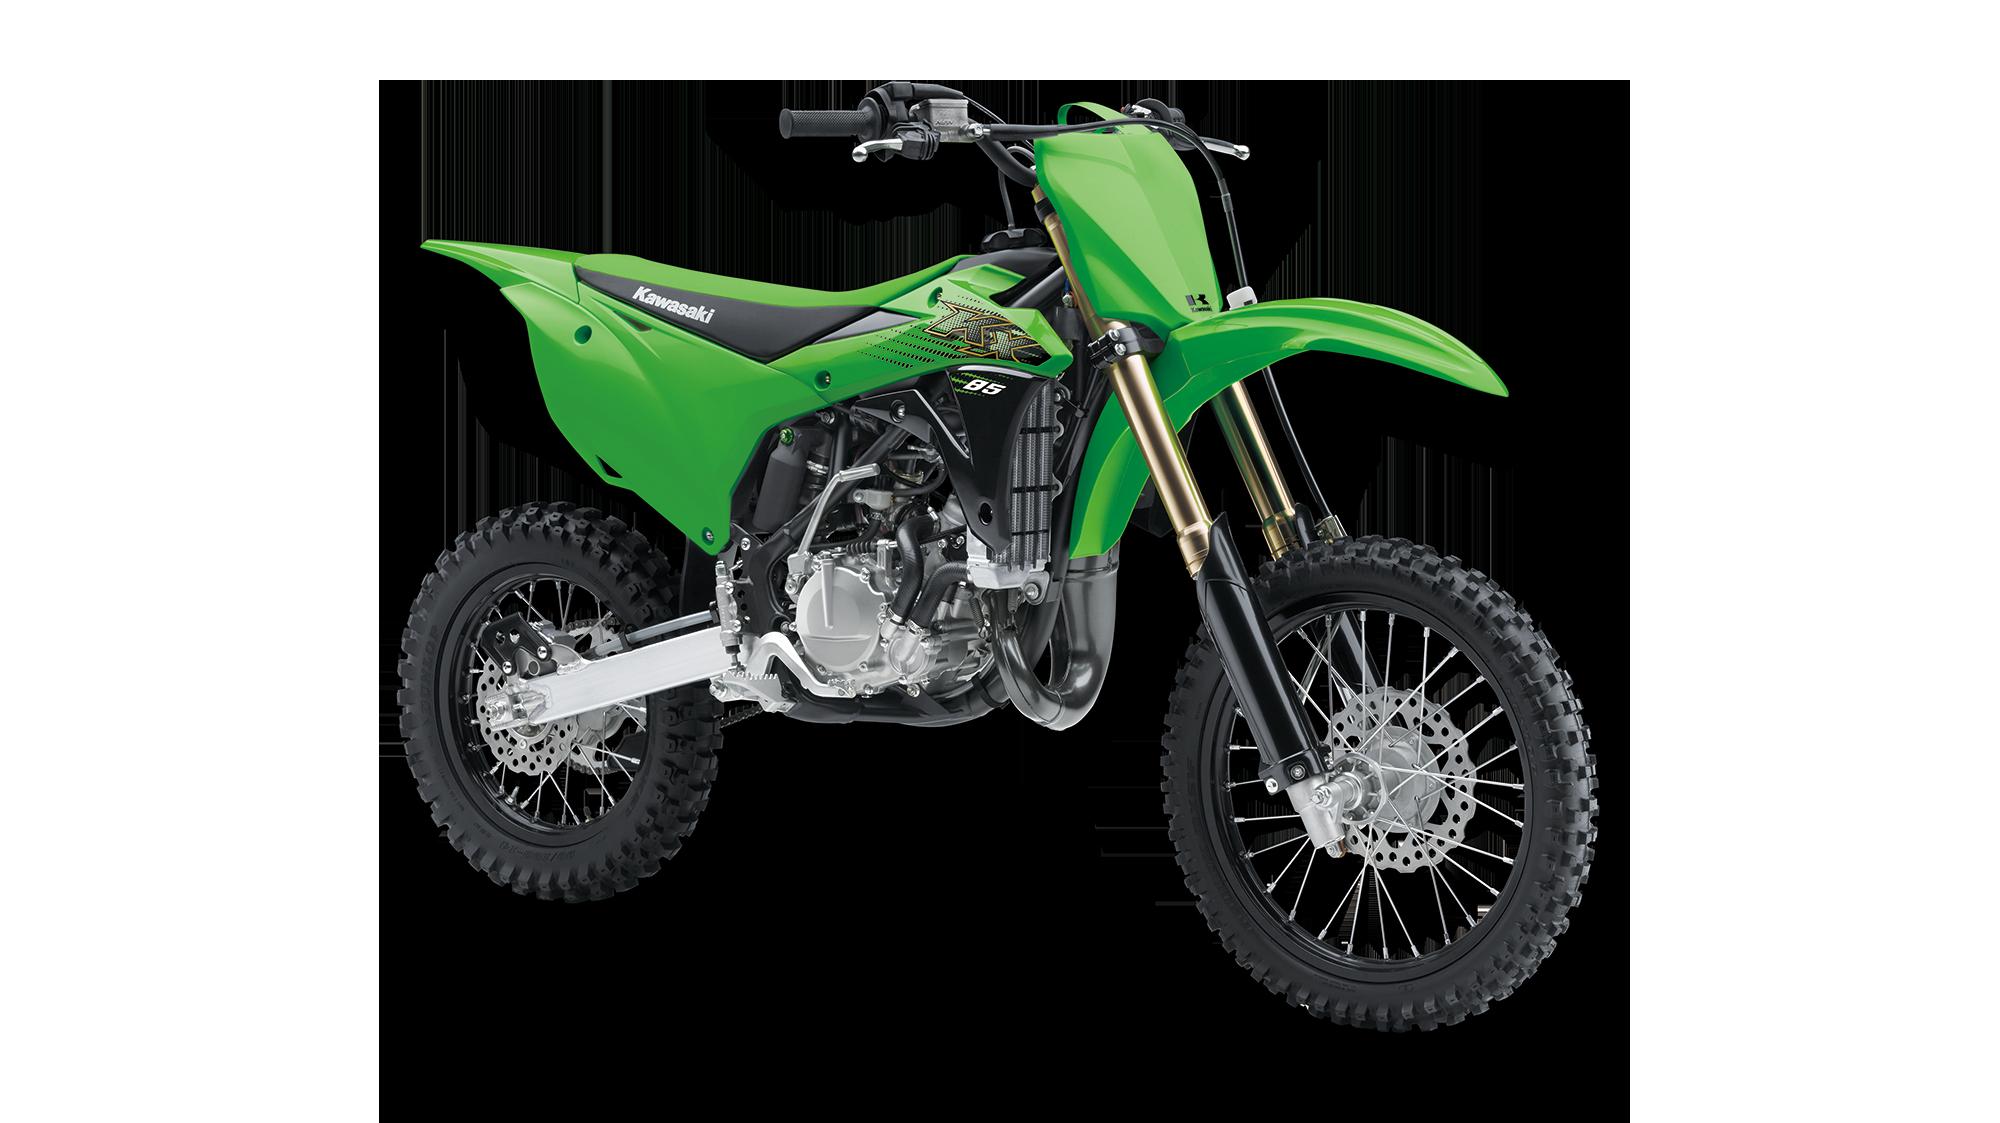 KX 85 II   Motos Thomas Webshop, Kawasaki, Vespa, Piaggio